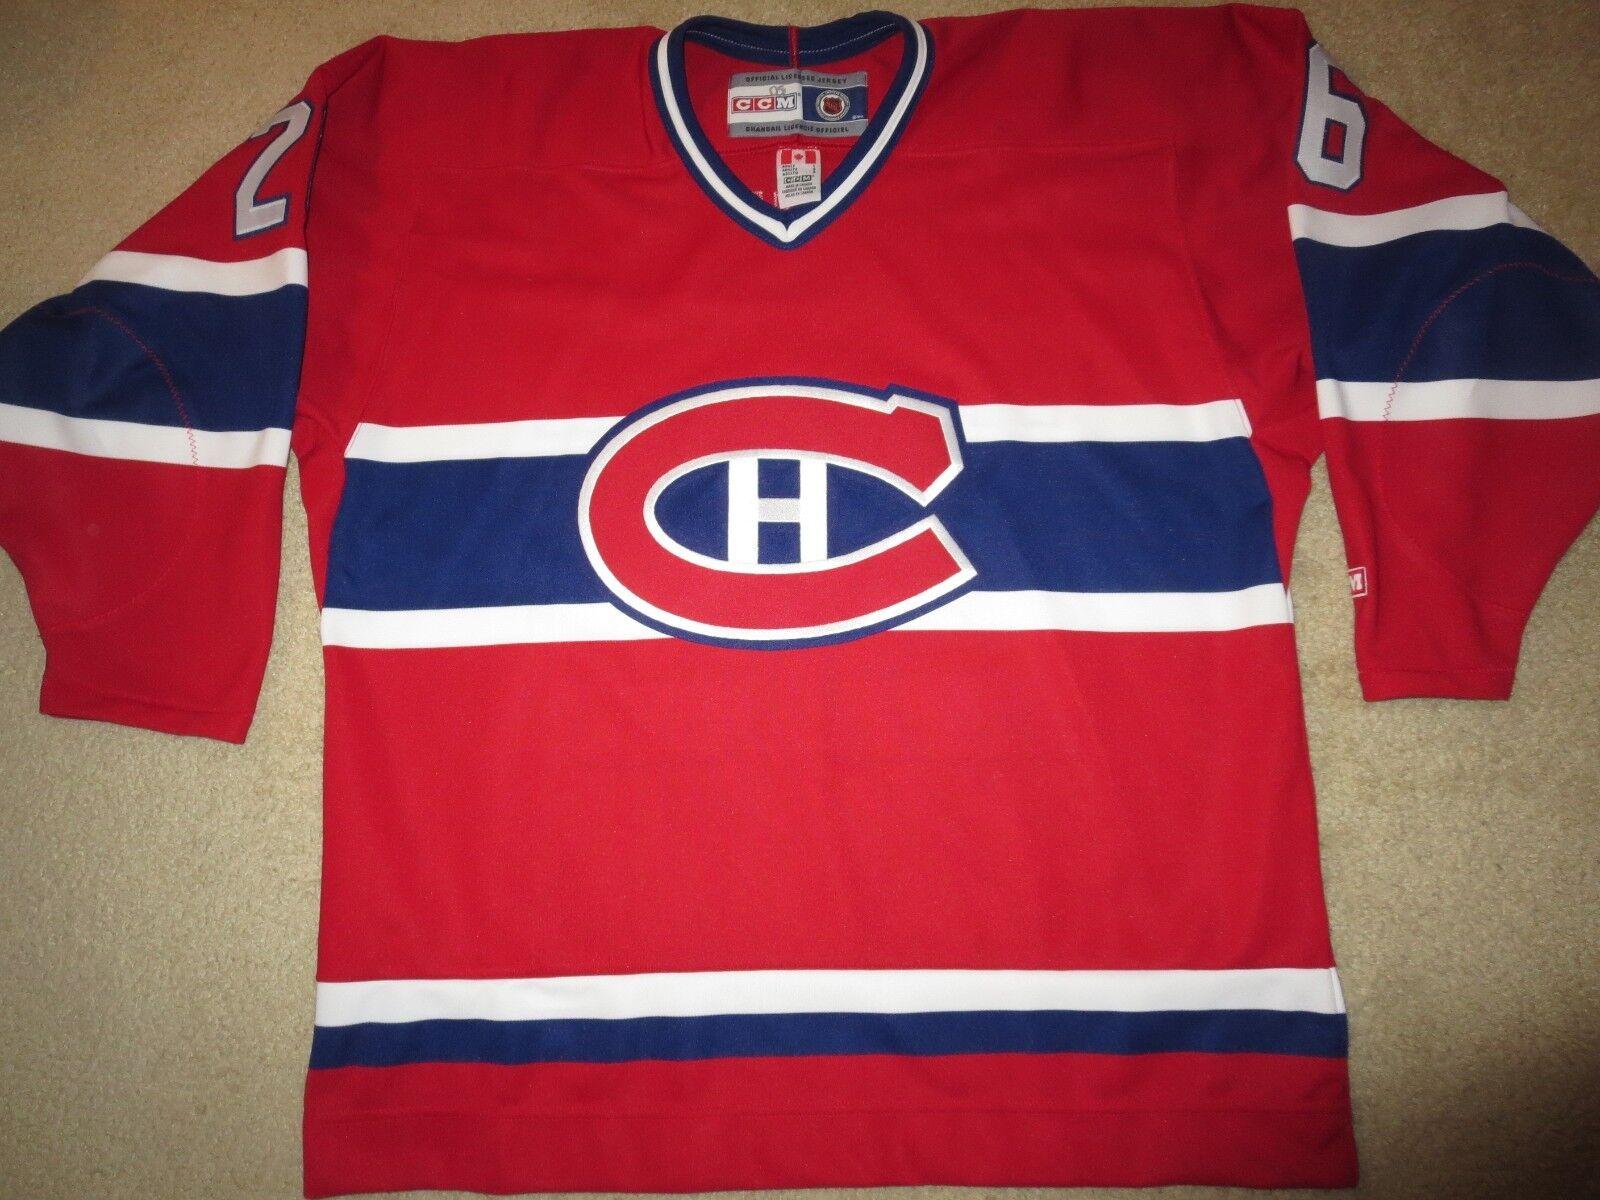 Montreal Canadians  26 NHL Ccm Ccm Ccm Hockey Cosidos Camiseta para Lg c69288